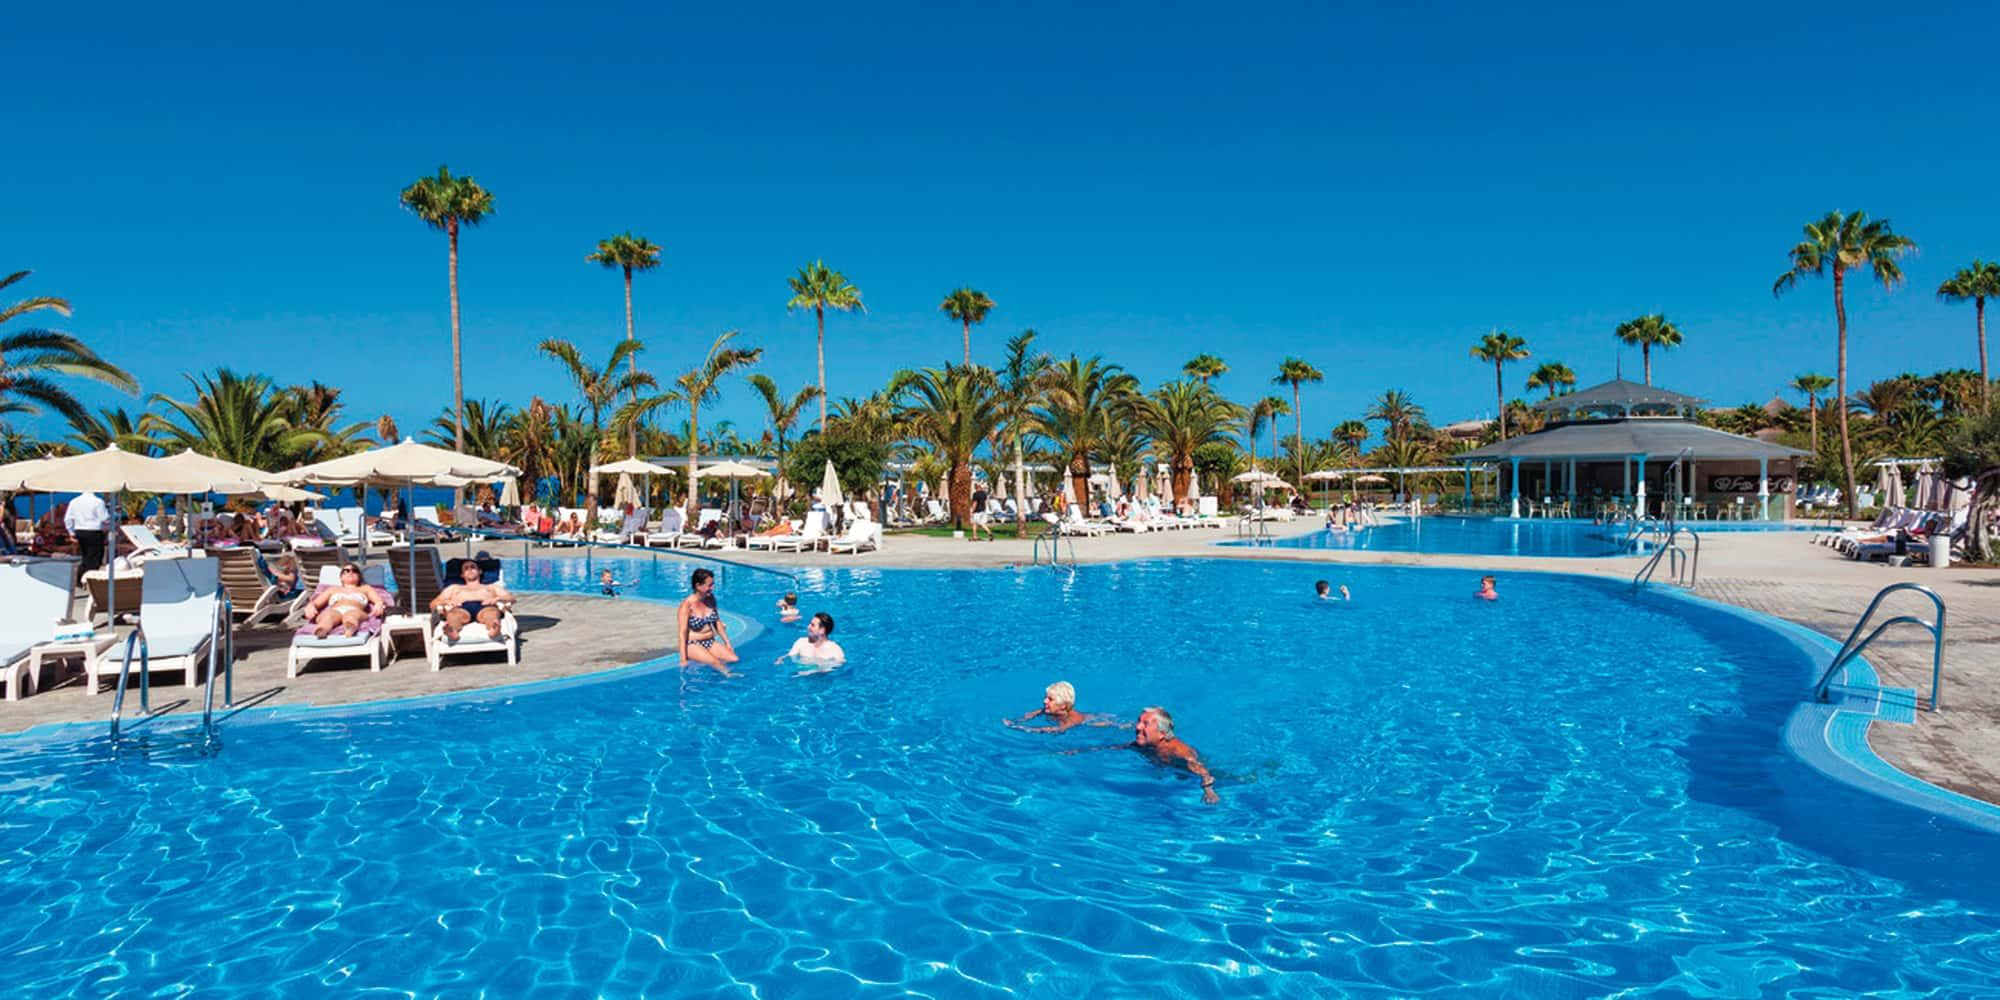 Hotel riu palace tres islas wellnesshotel strand van corralejo - Hotel Riu Palace Tres Islas Wellnesshotel Strand Van Corralejo 1